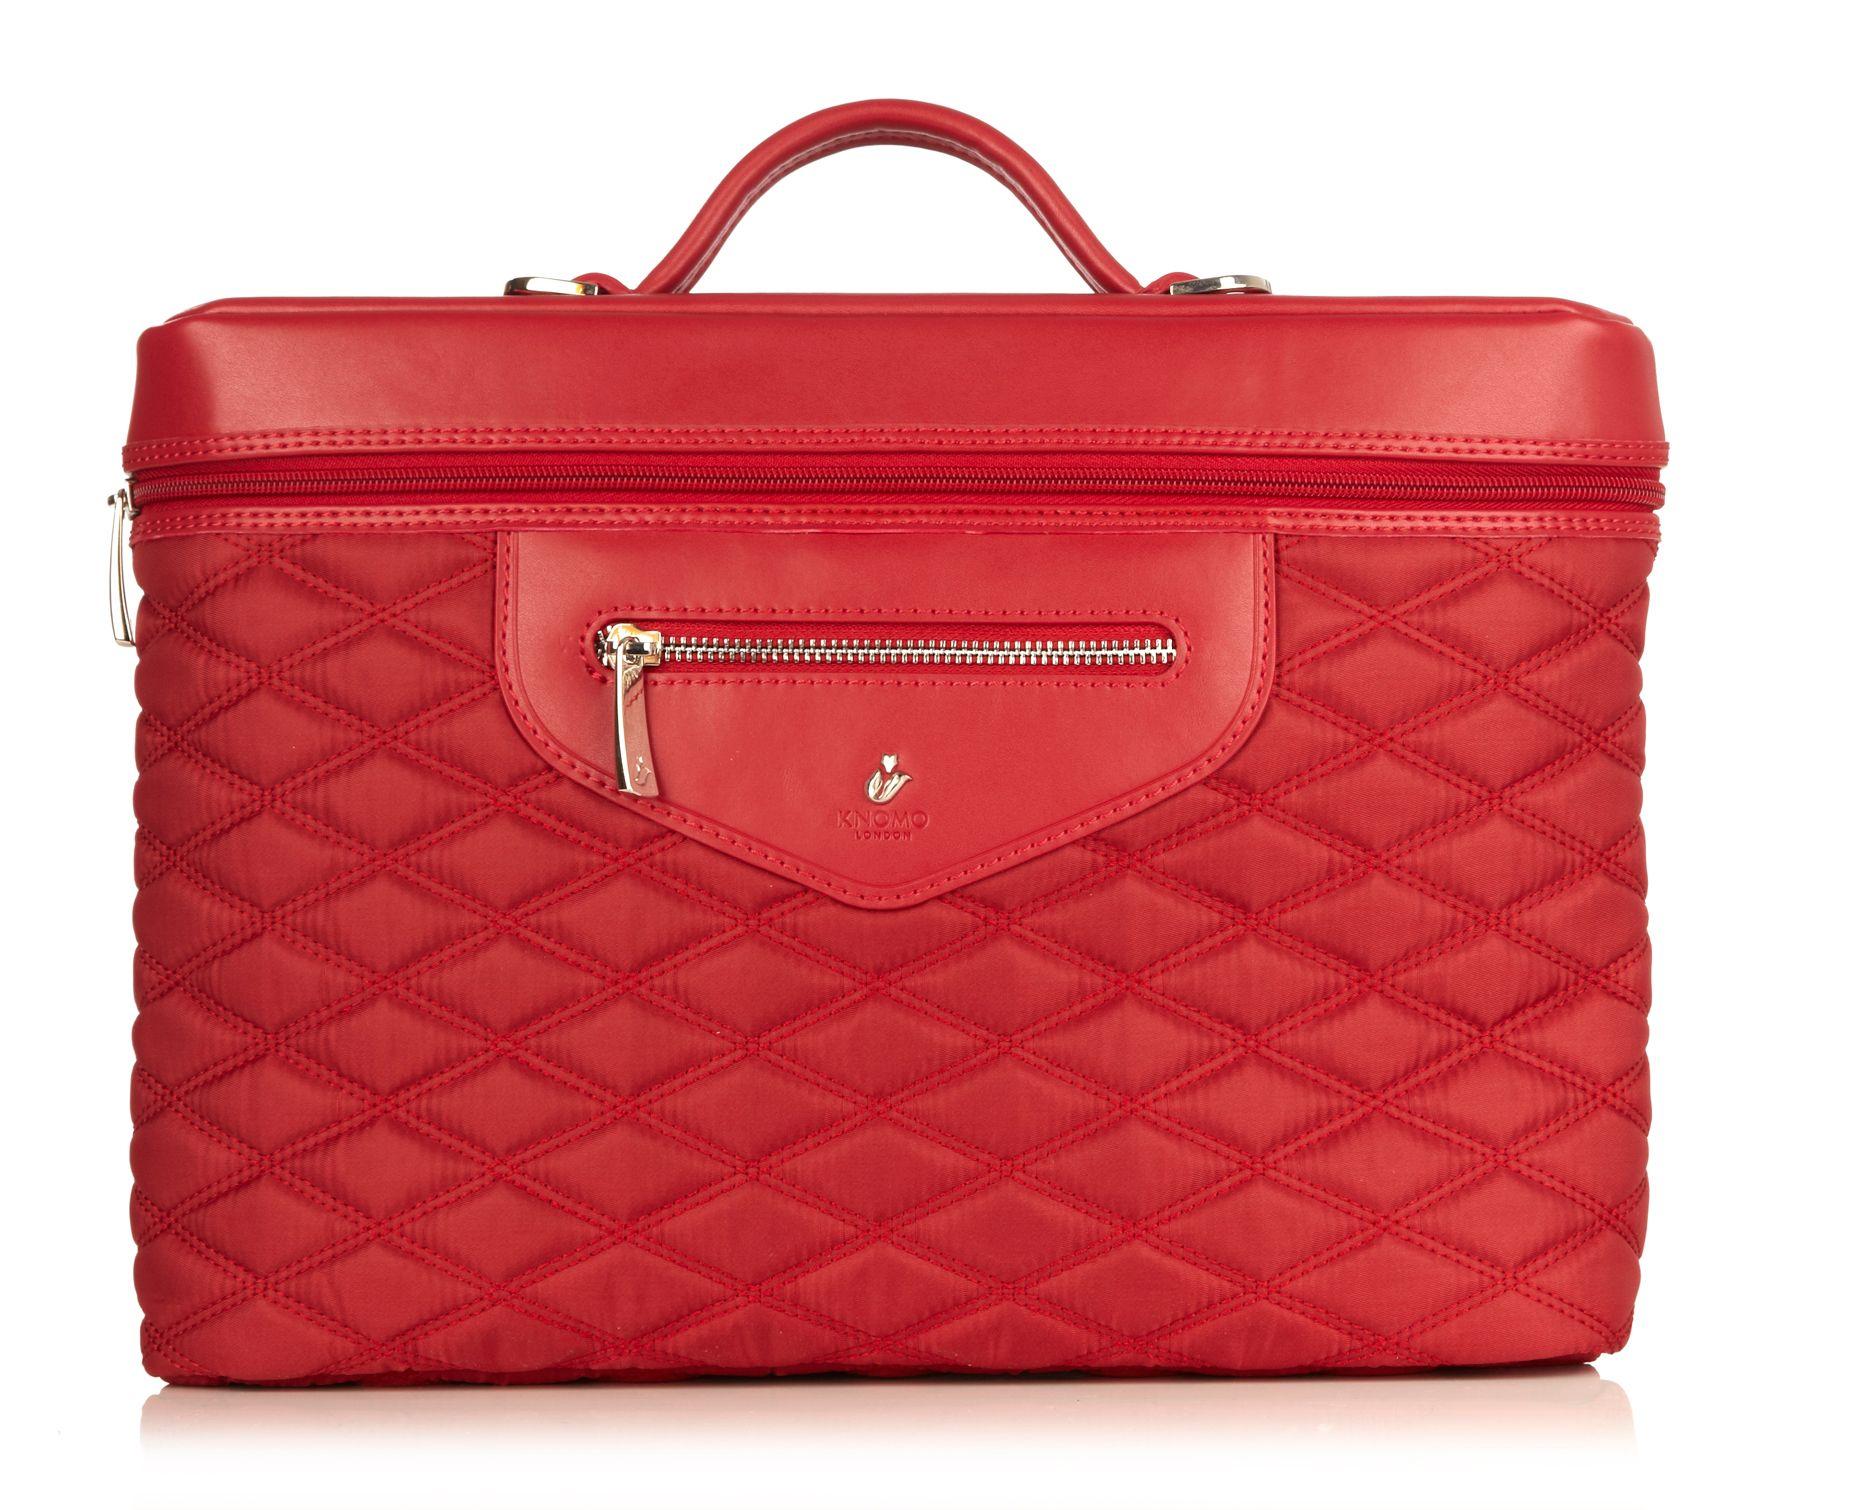 Armani Jeans Messenger Bag House Of Fraser Frenchafricana. Handbags Harrods f2a1633ae2e06